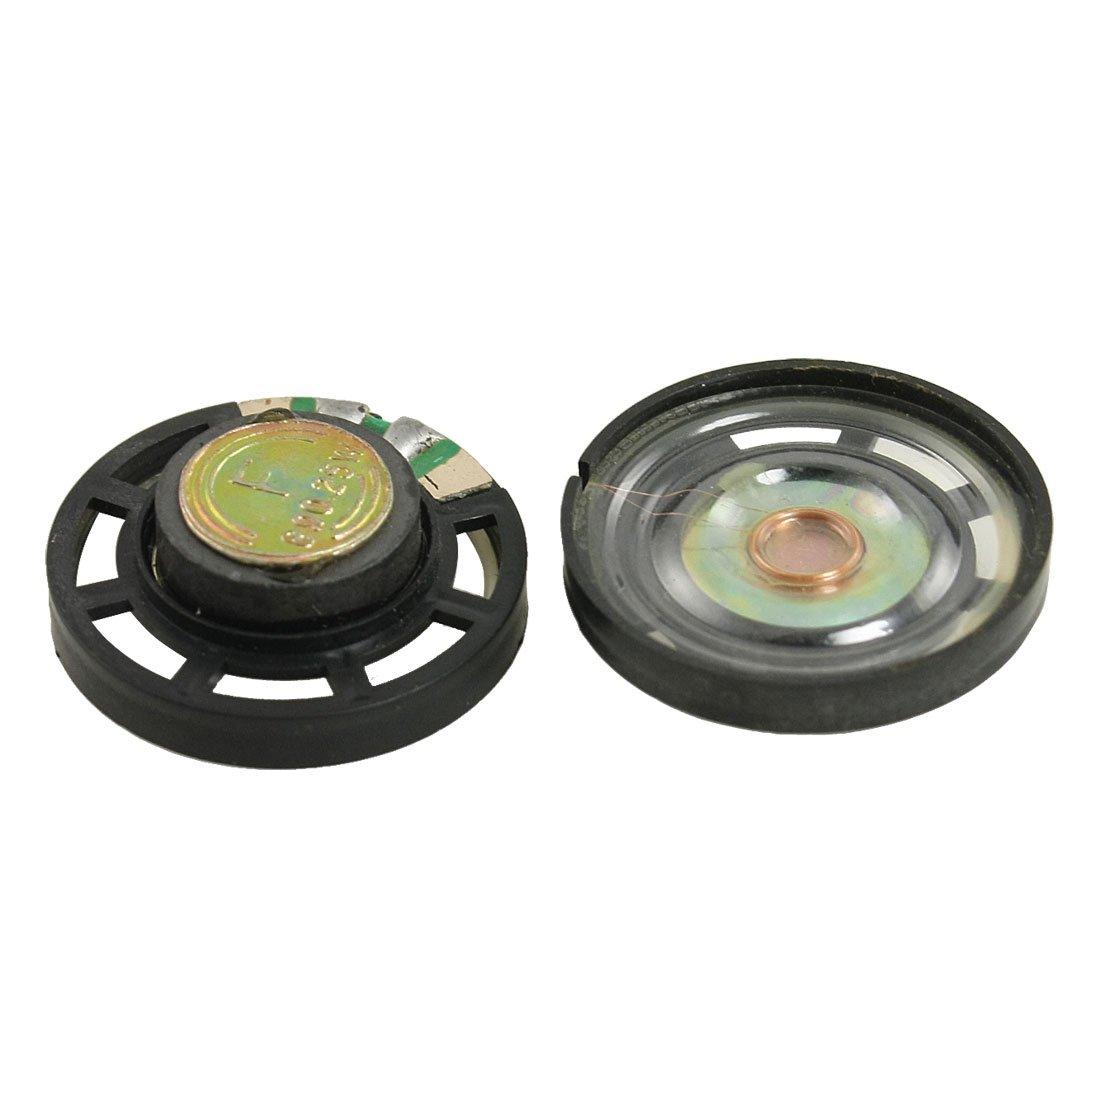 2x External Magnetic Type Round Plastic Shell Speaker 8 Ohm 0.25W 2 Pcs(China (Mainland))